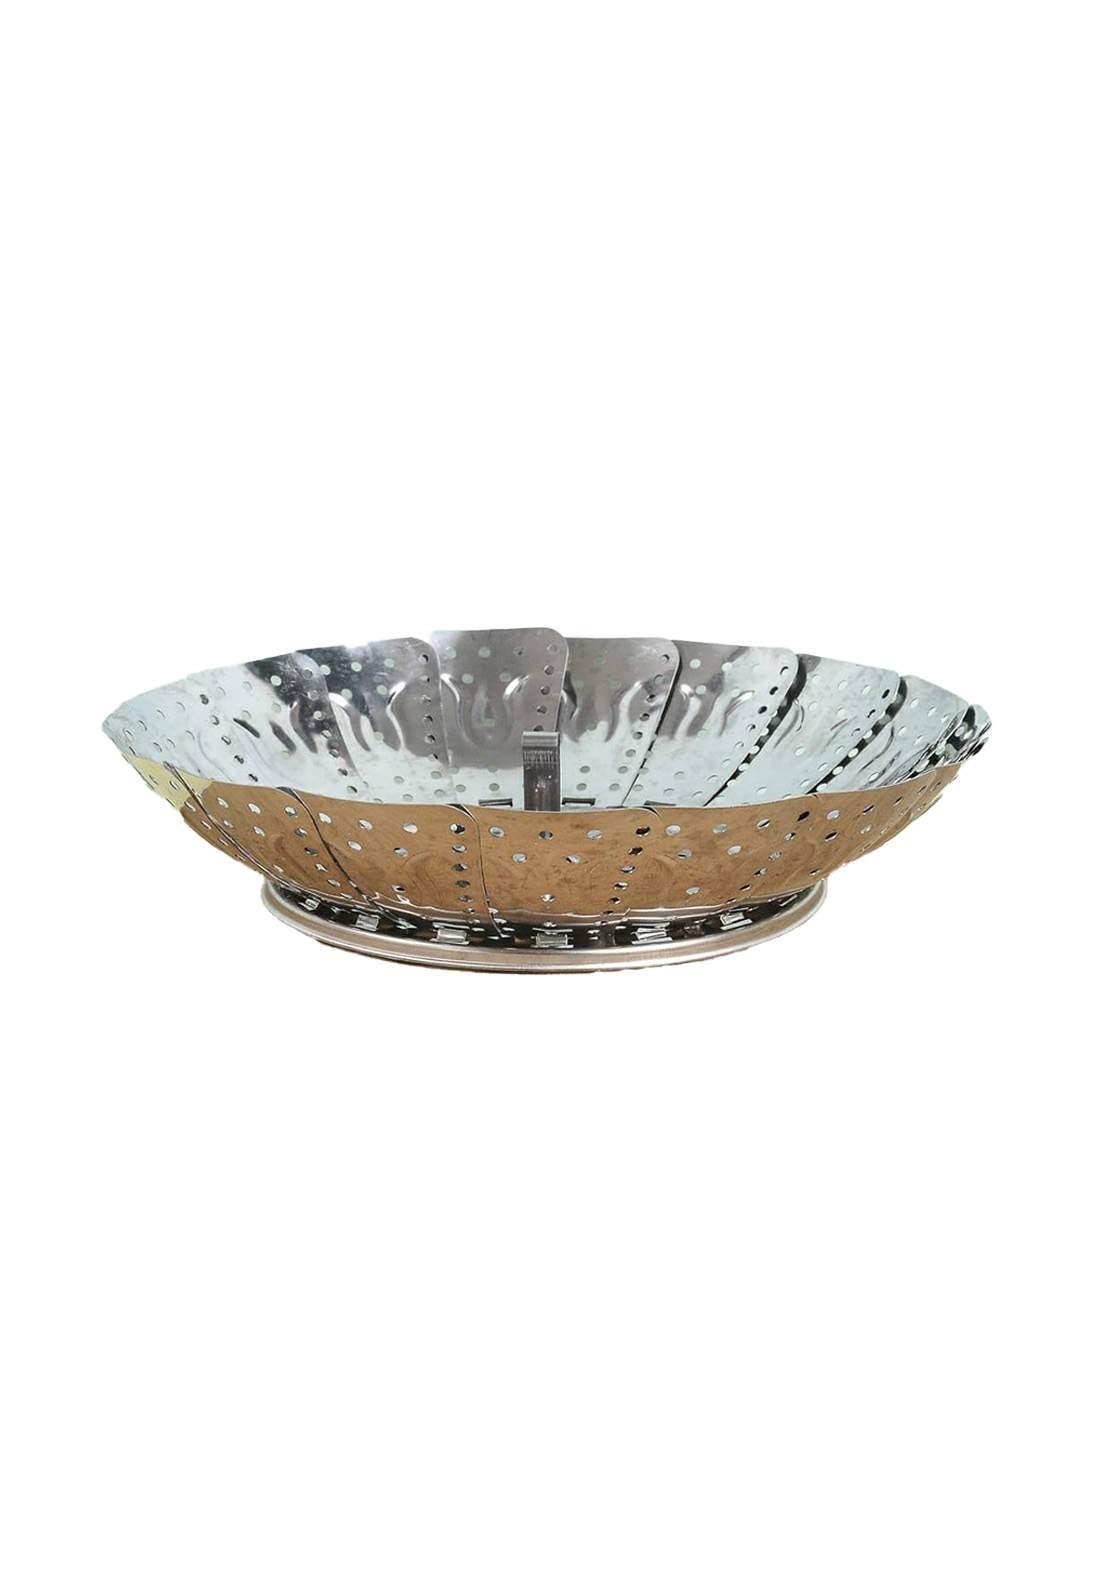 Stainless steel Basket مصفي معدني قابل للطي